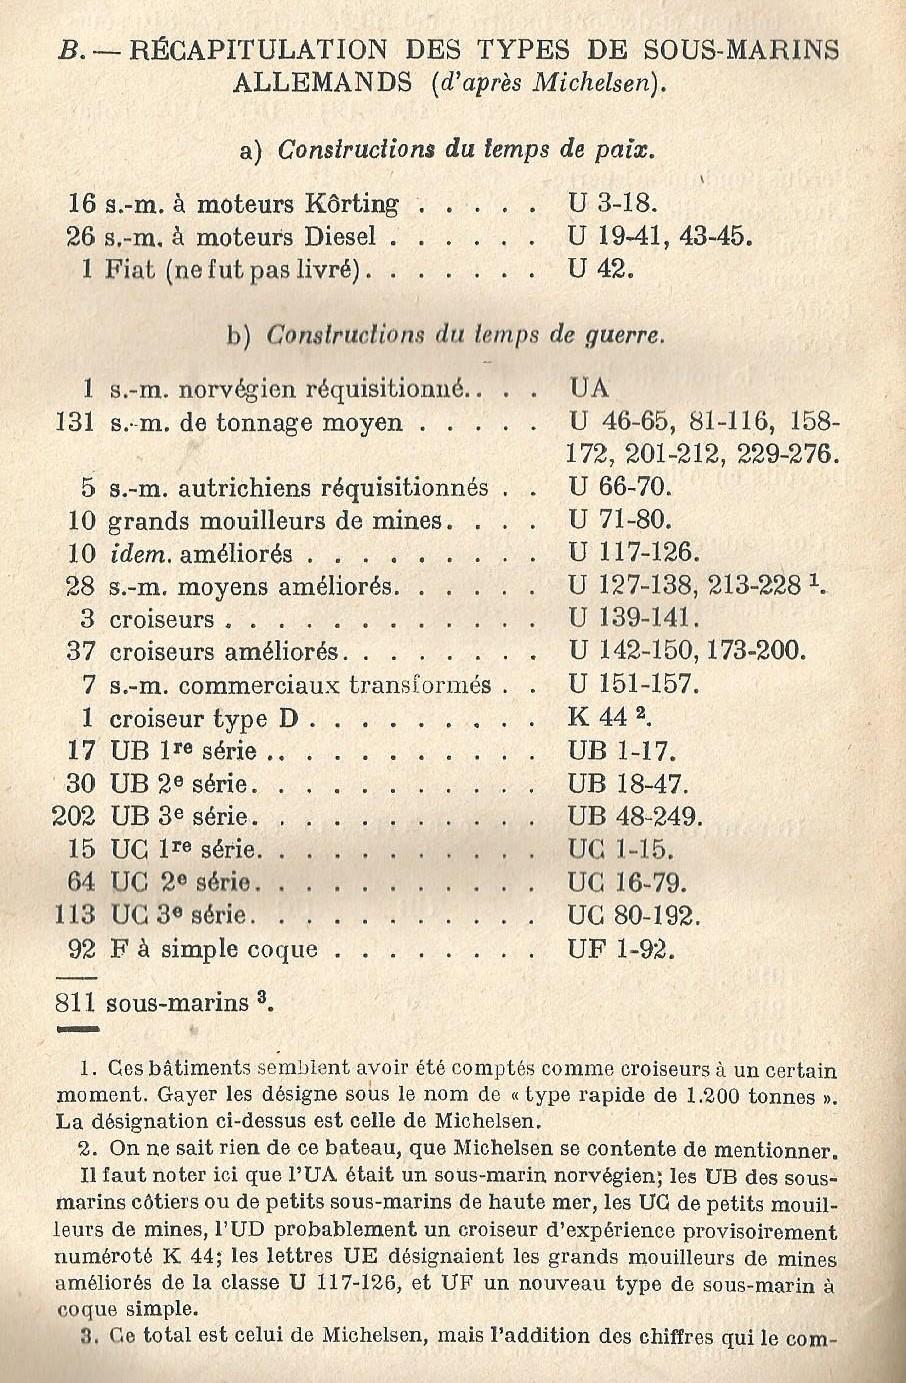 U Boote de 14-18 - Page 2 Liste_11